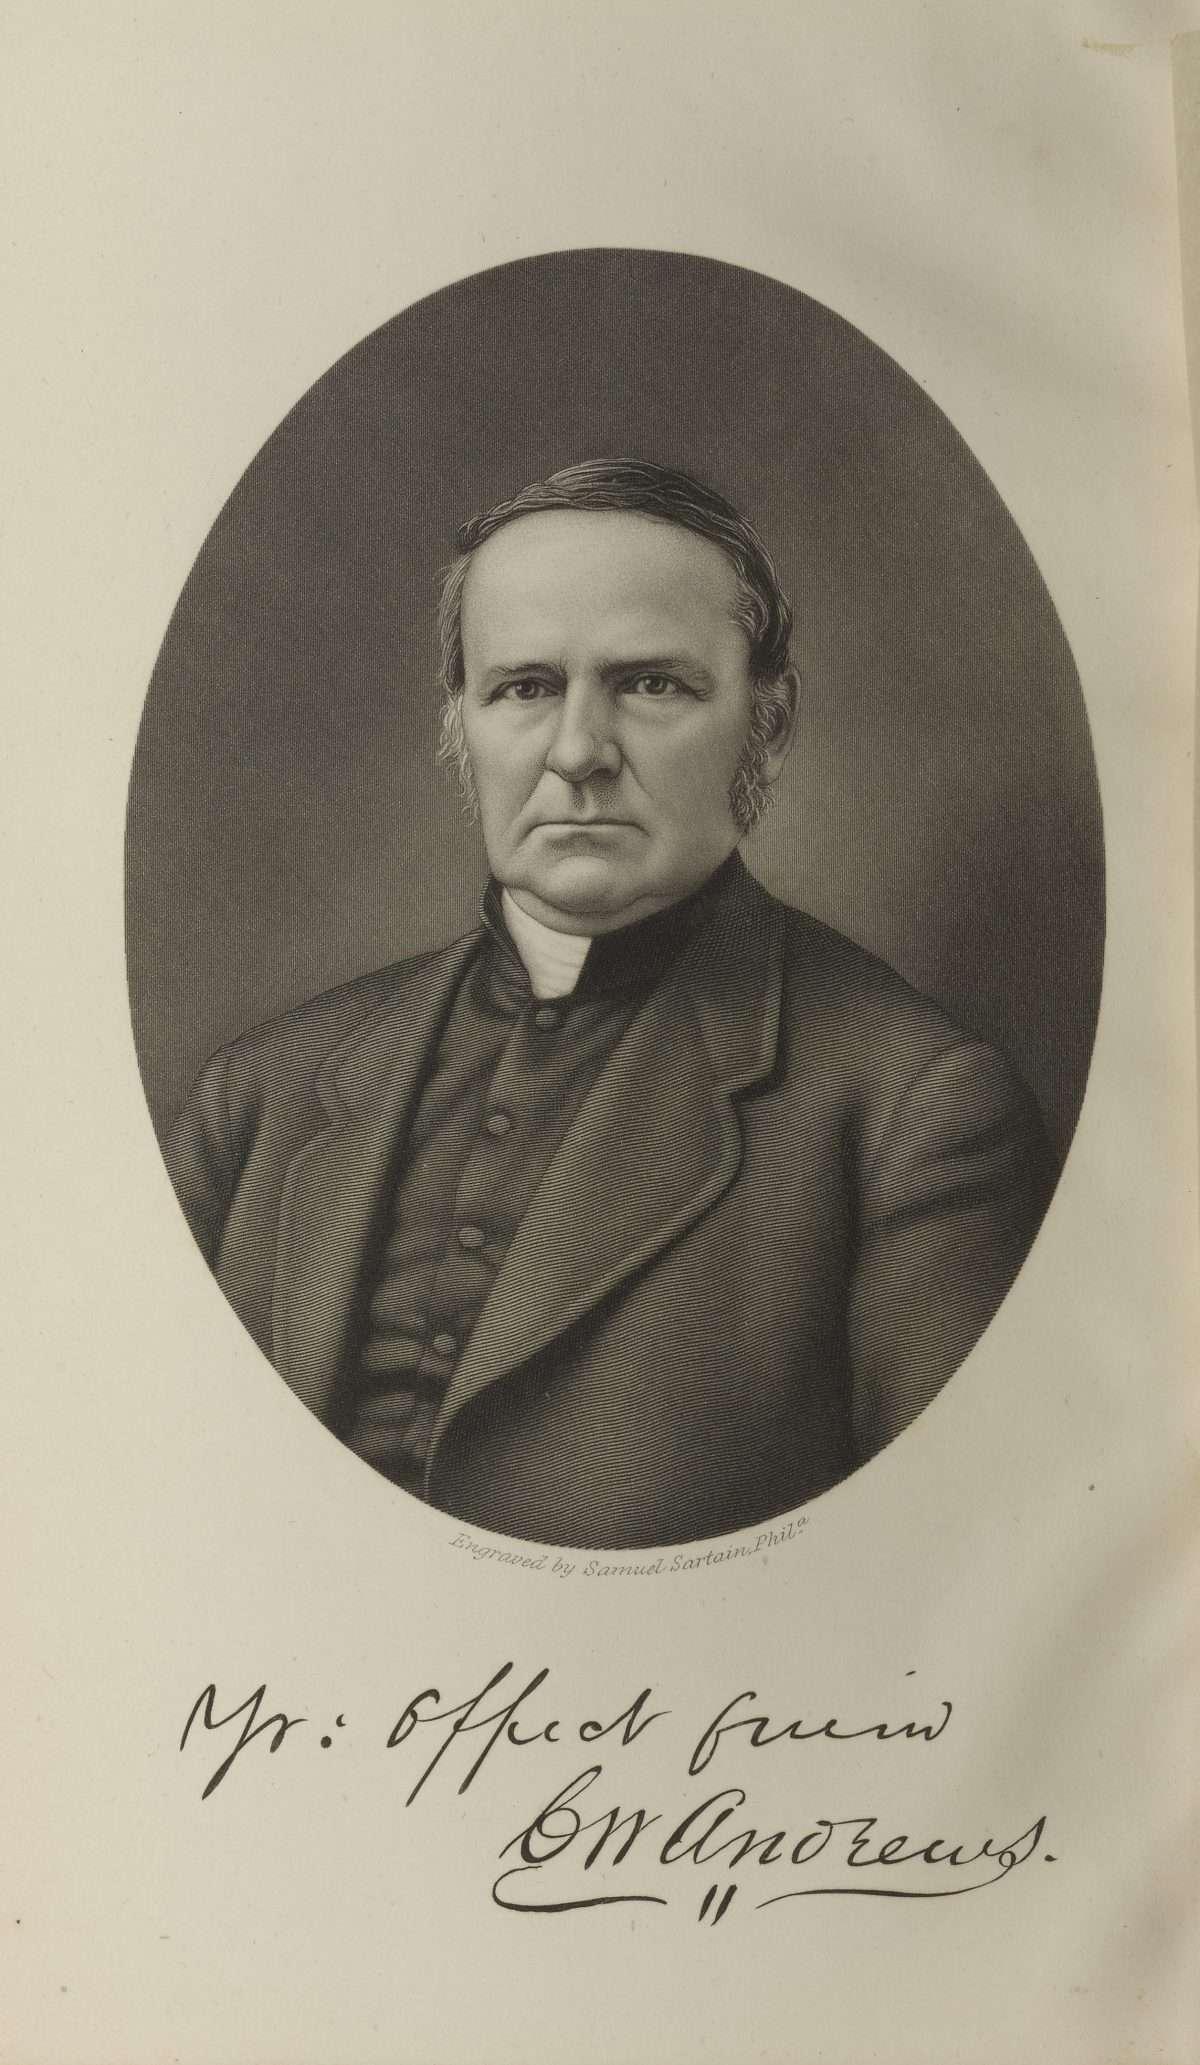 Reverend C. W. Andrews